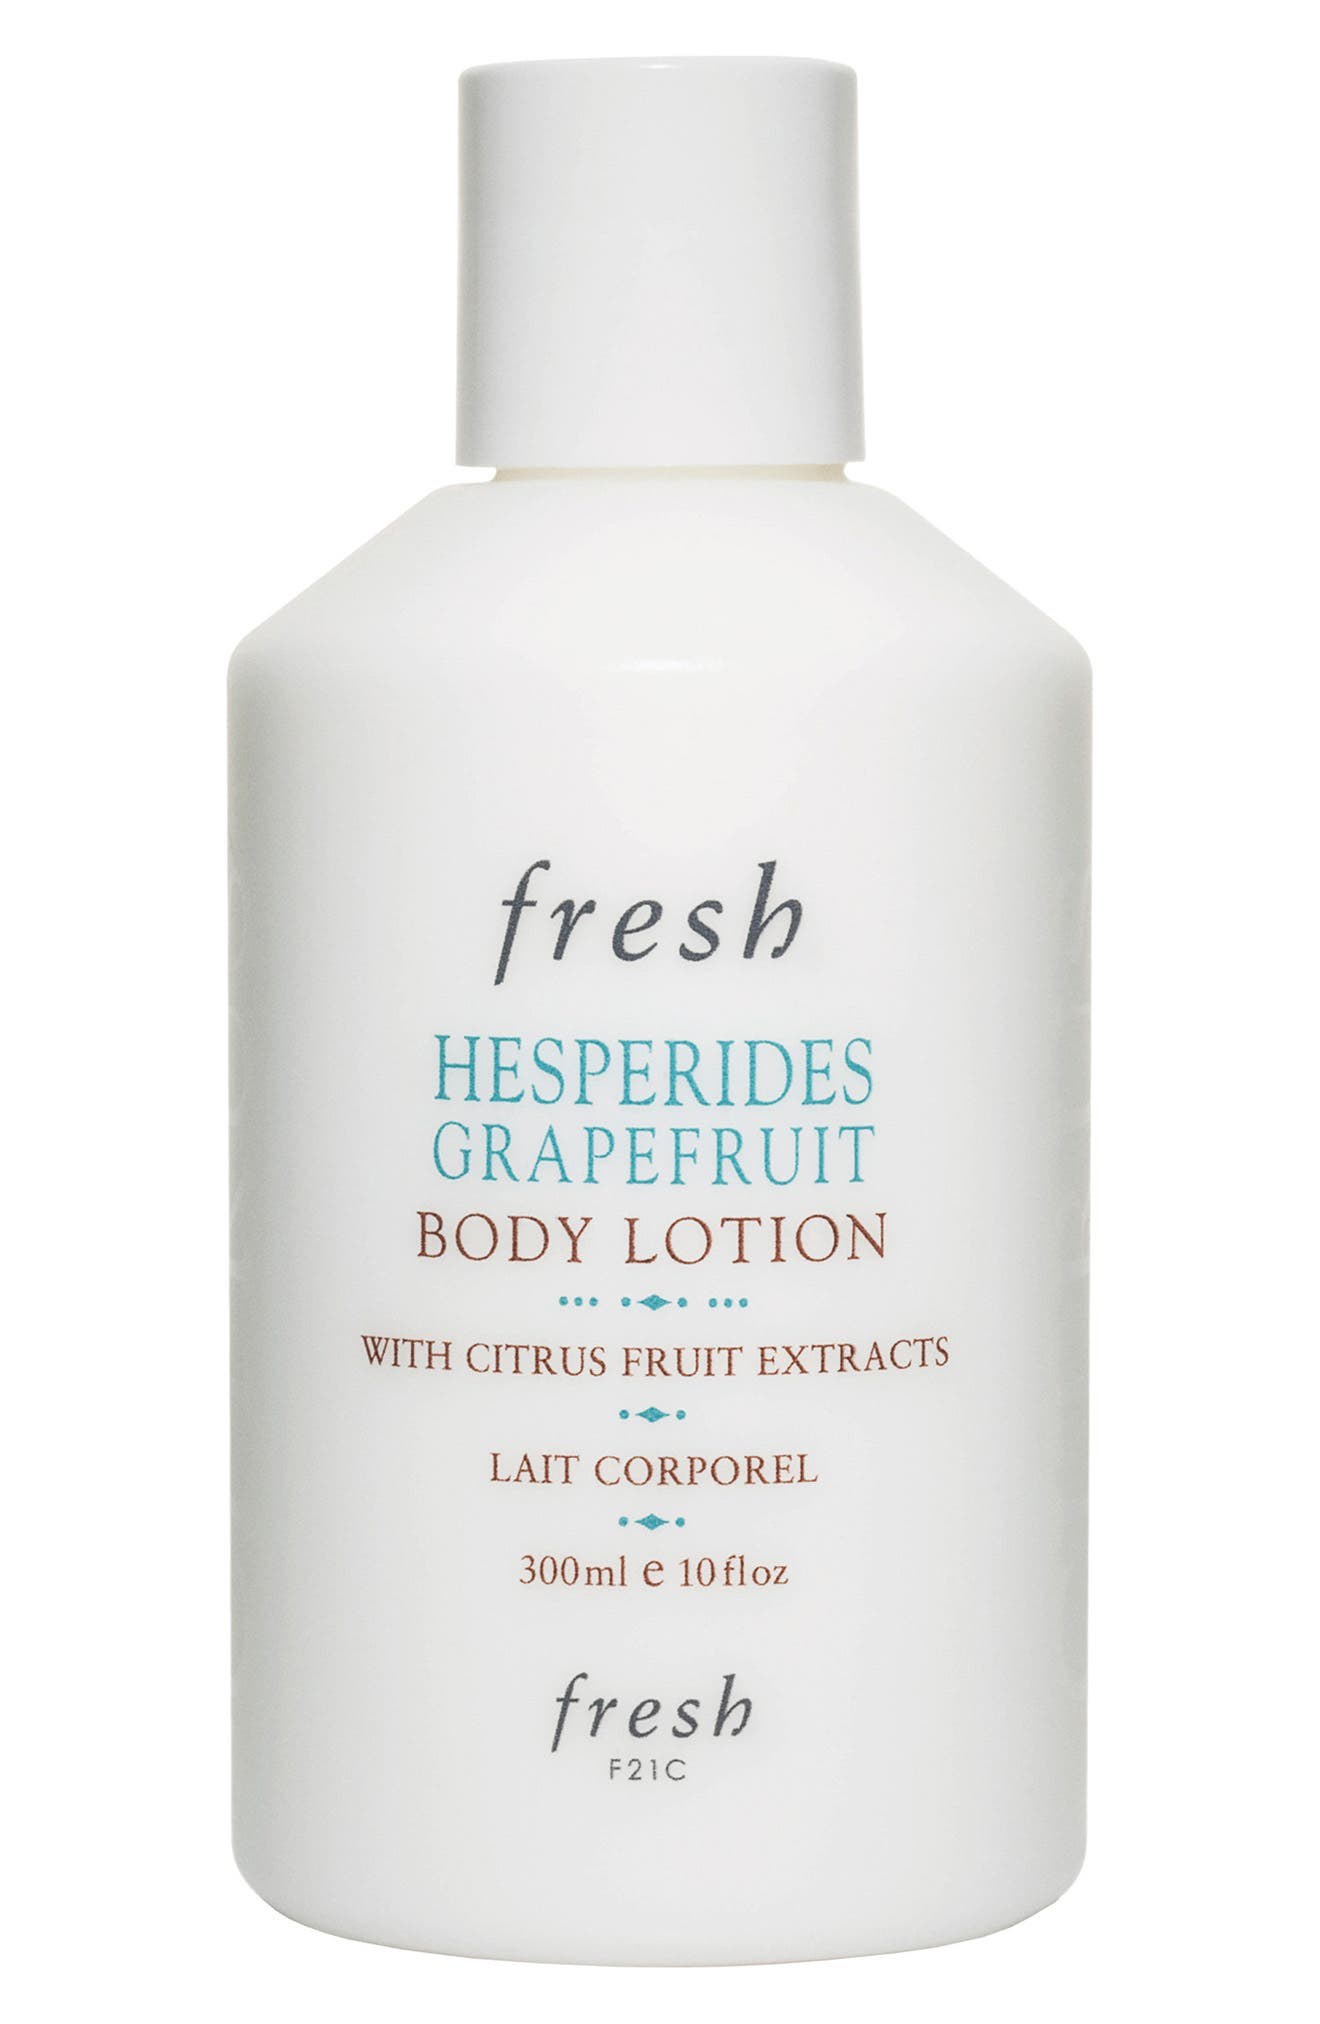 Fresh Hesperides Grapefruit Body Lotion